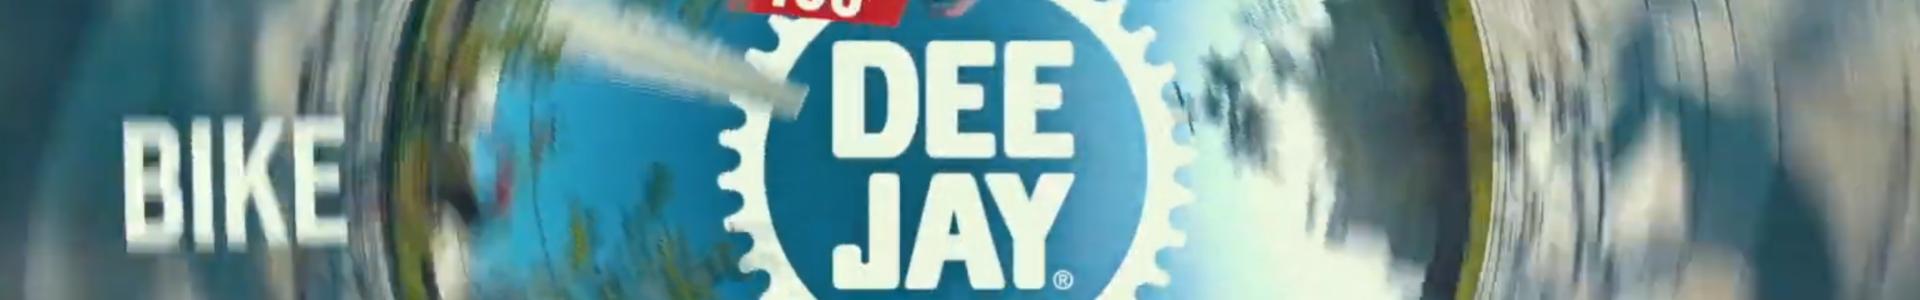 Teaser Deejay 100, 2019